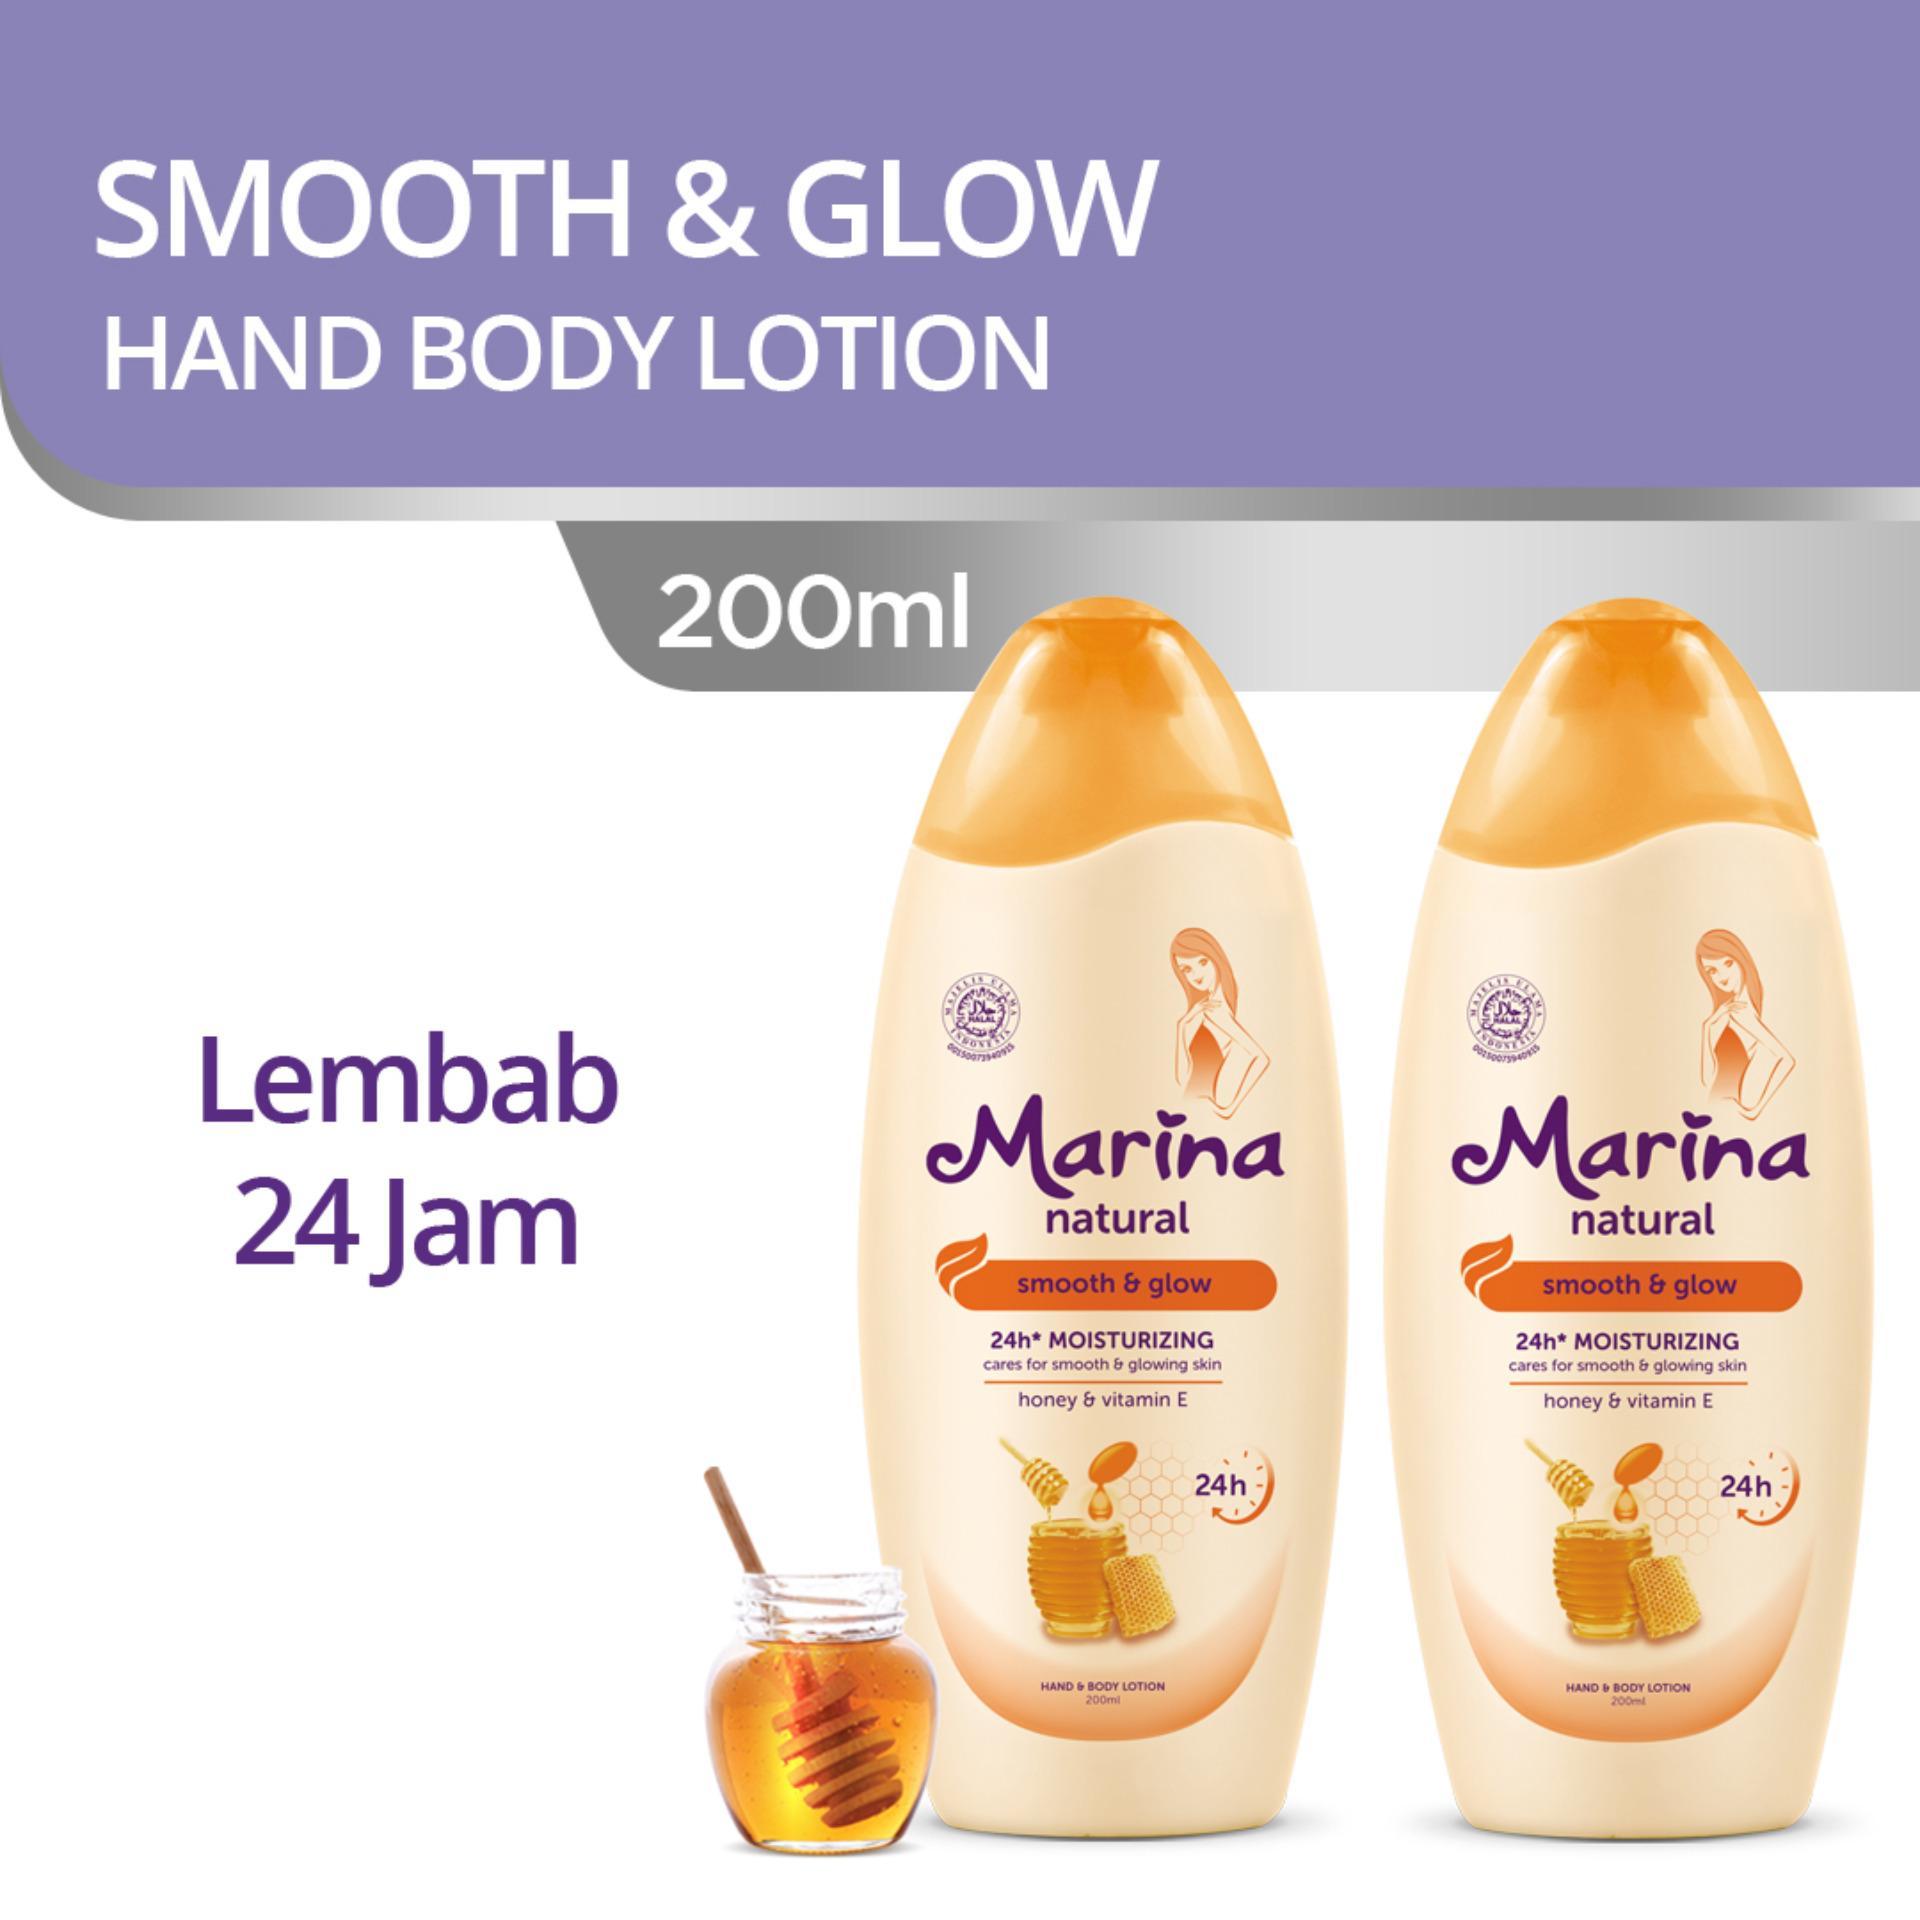 Kelebihan Kaila Natural Body Lotion 100ml Isi 3 Pcs Mix Terkini Collagen Nasa Marina Hand Smooth Glow 200 Ml